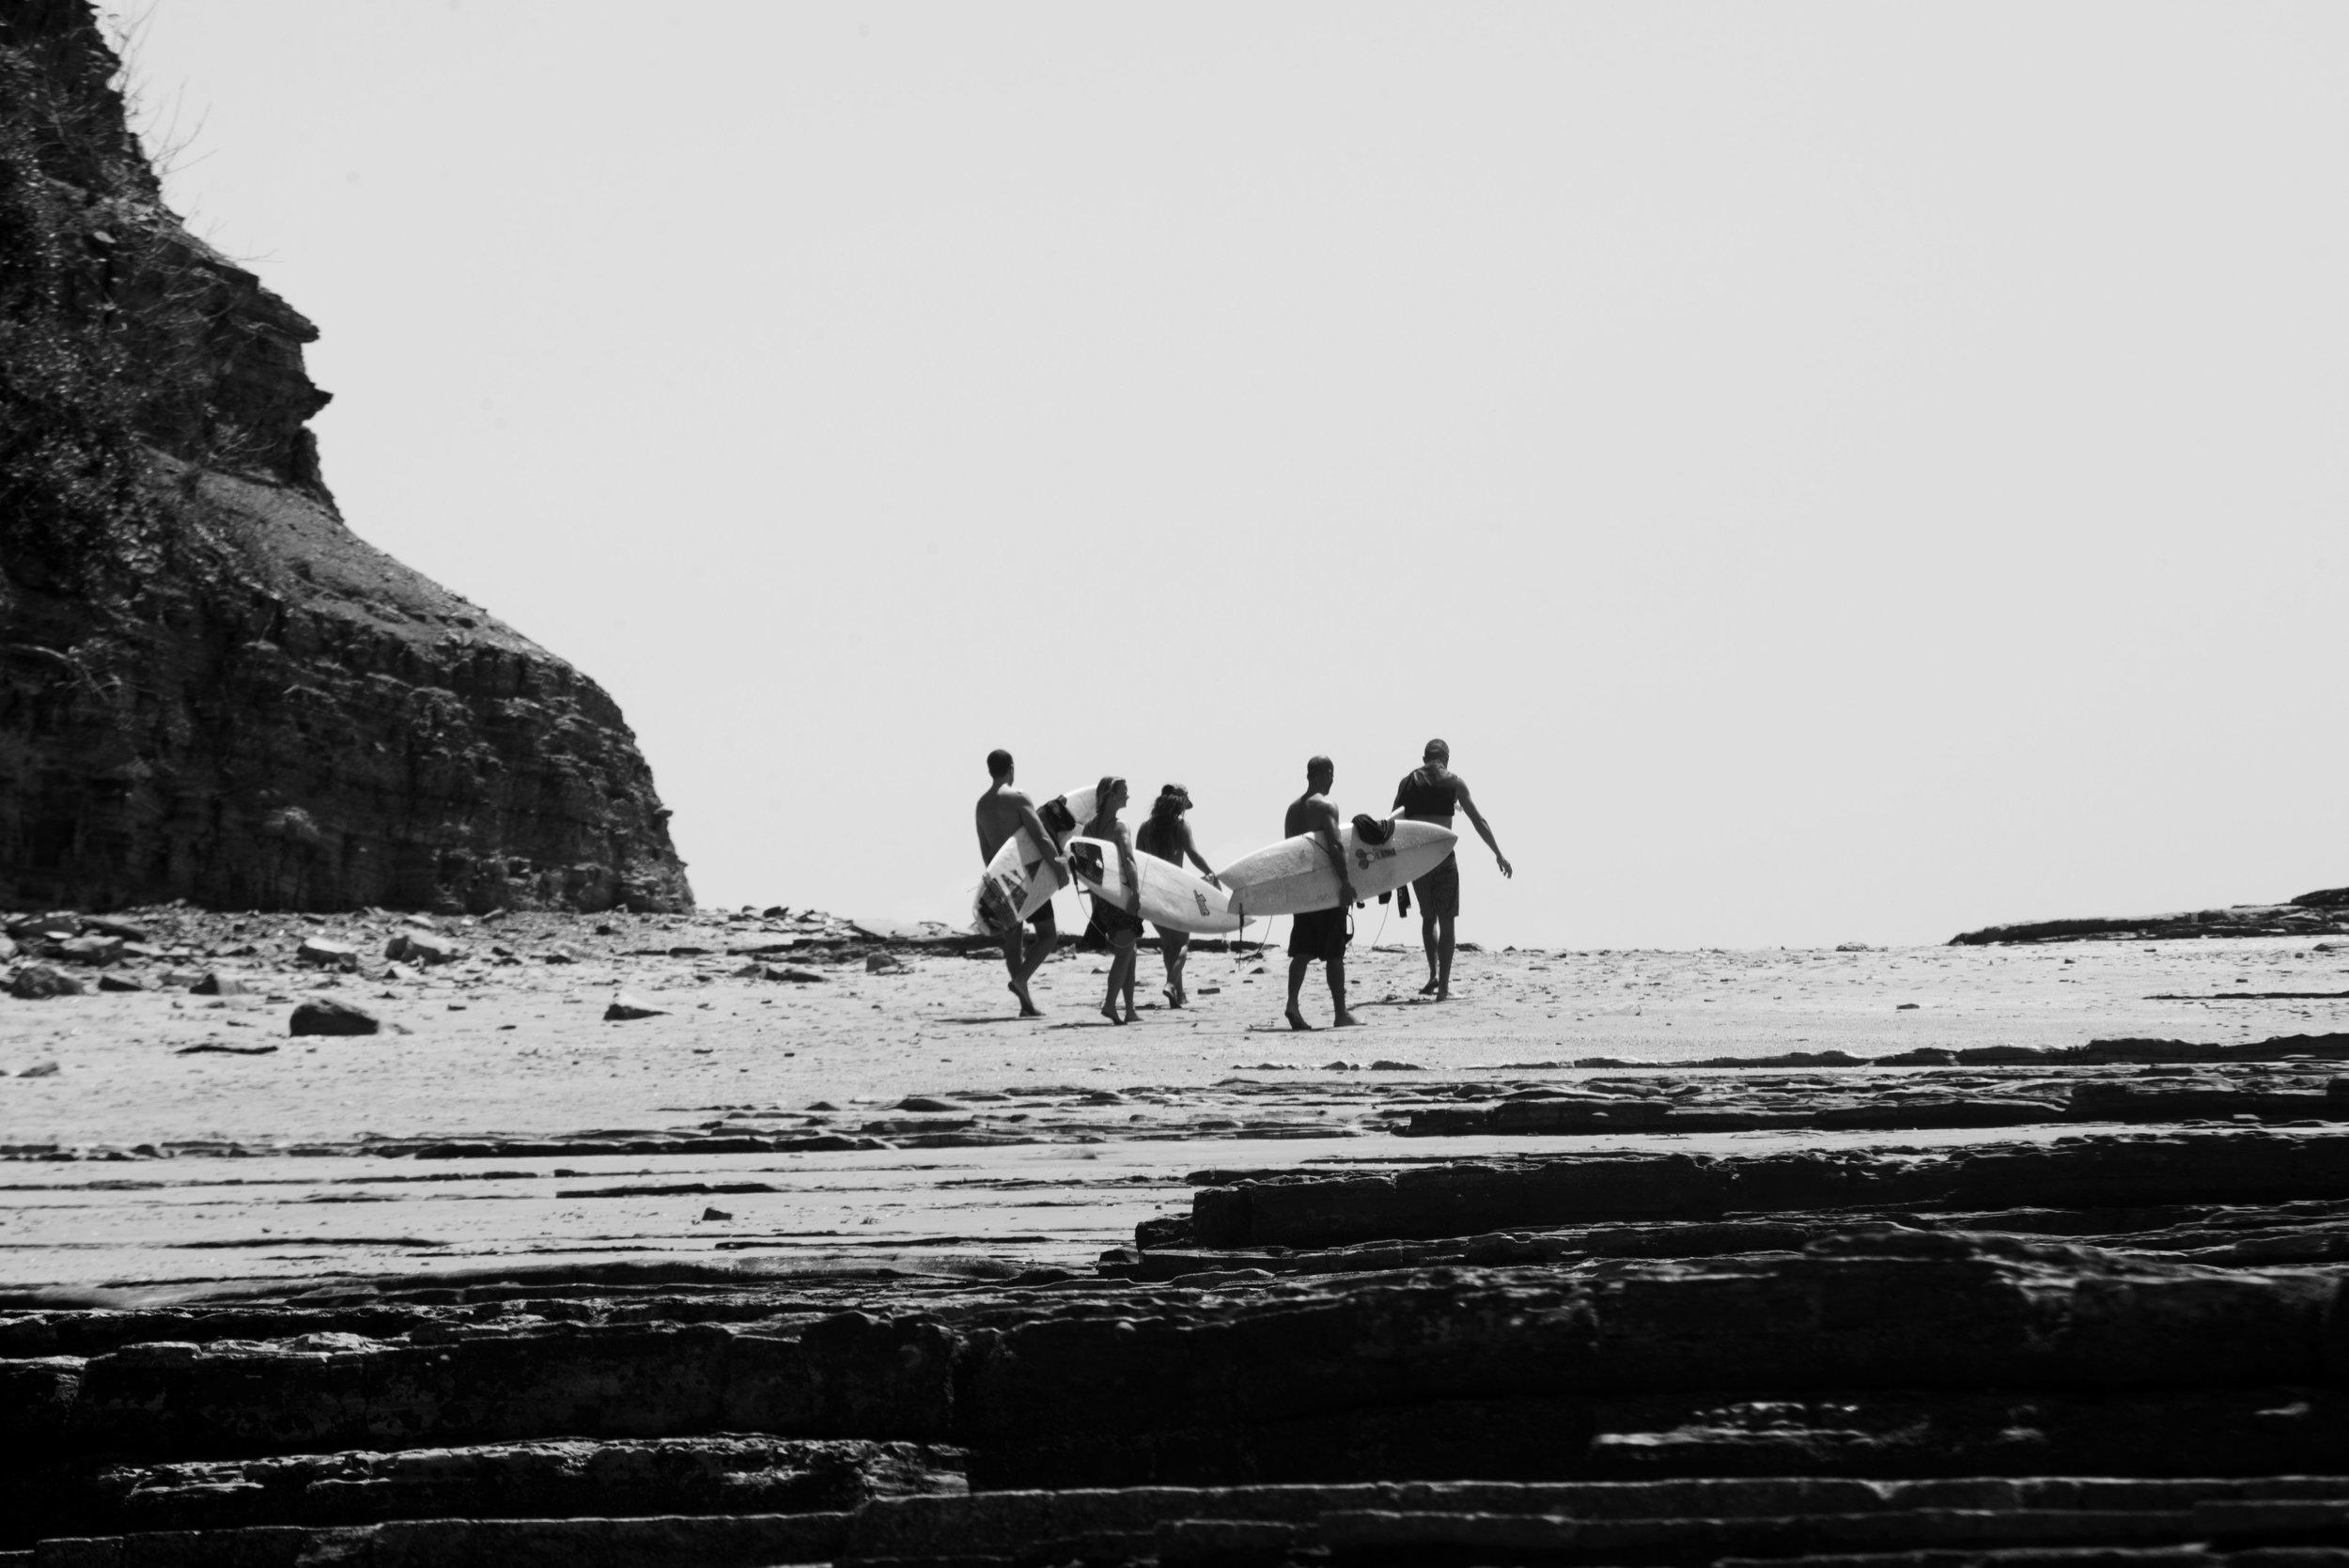 surfers popoyo salt water